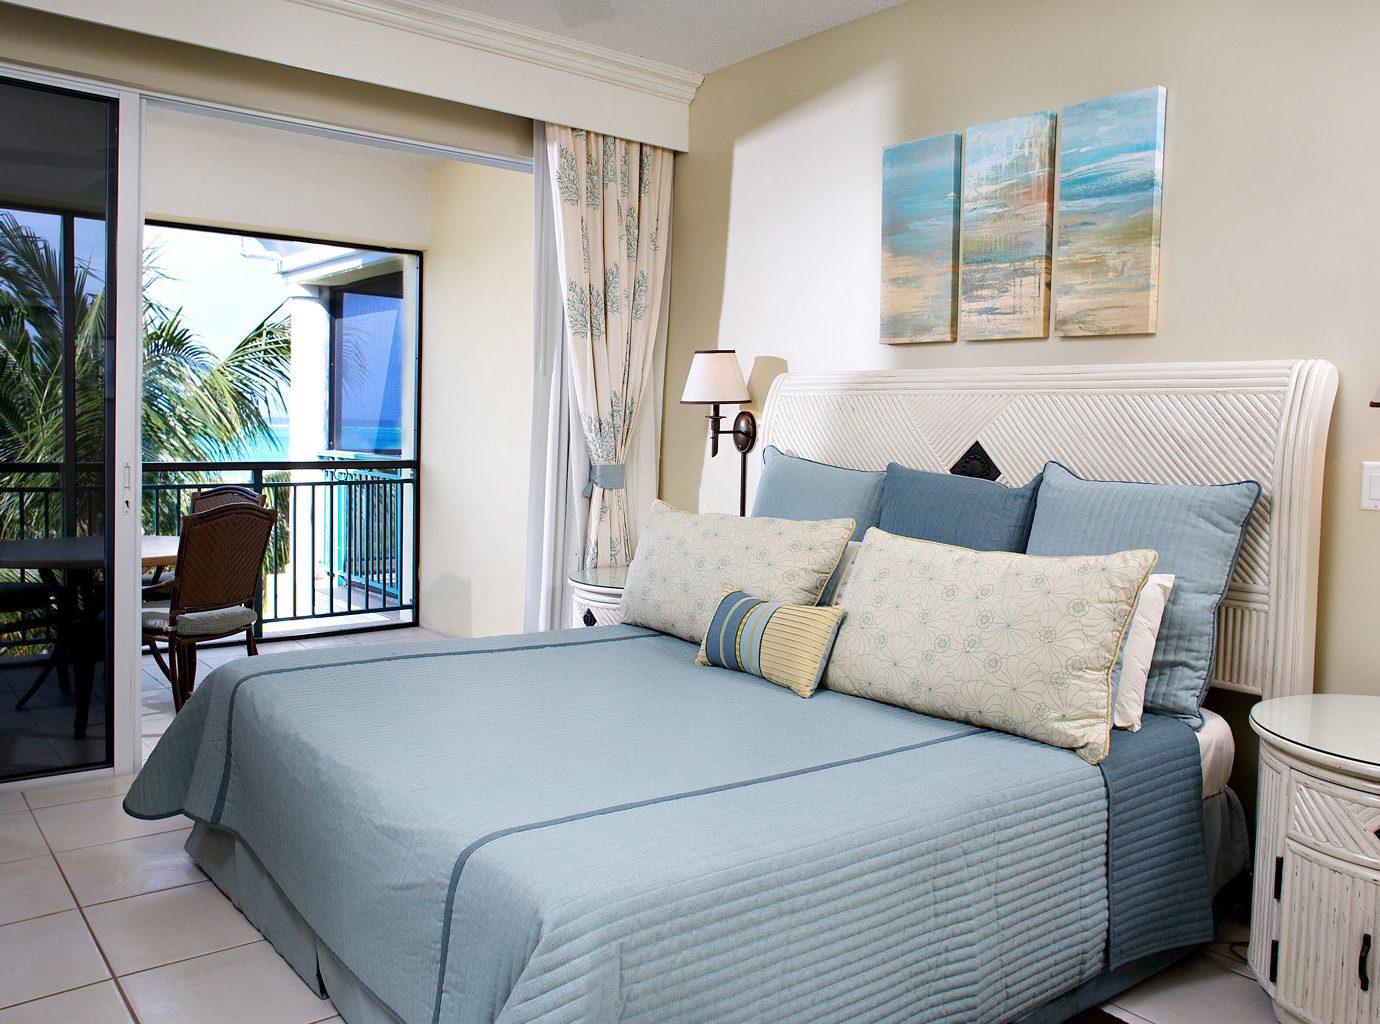 Balcony Bedroom Family Island Resort Scenic views Tropical property condominium living room Suite home cottage